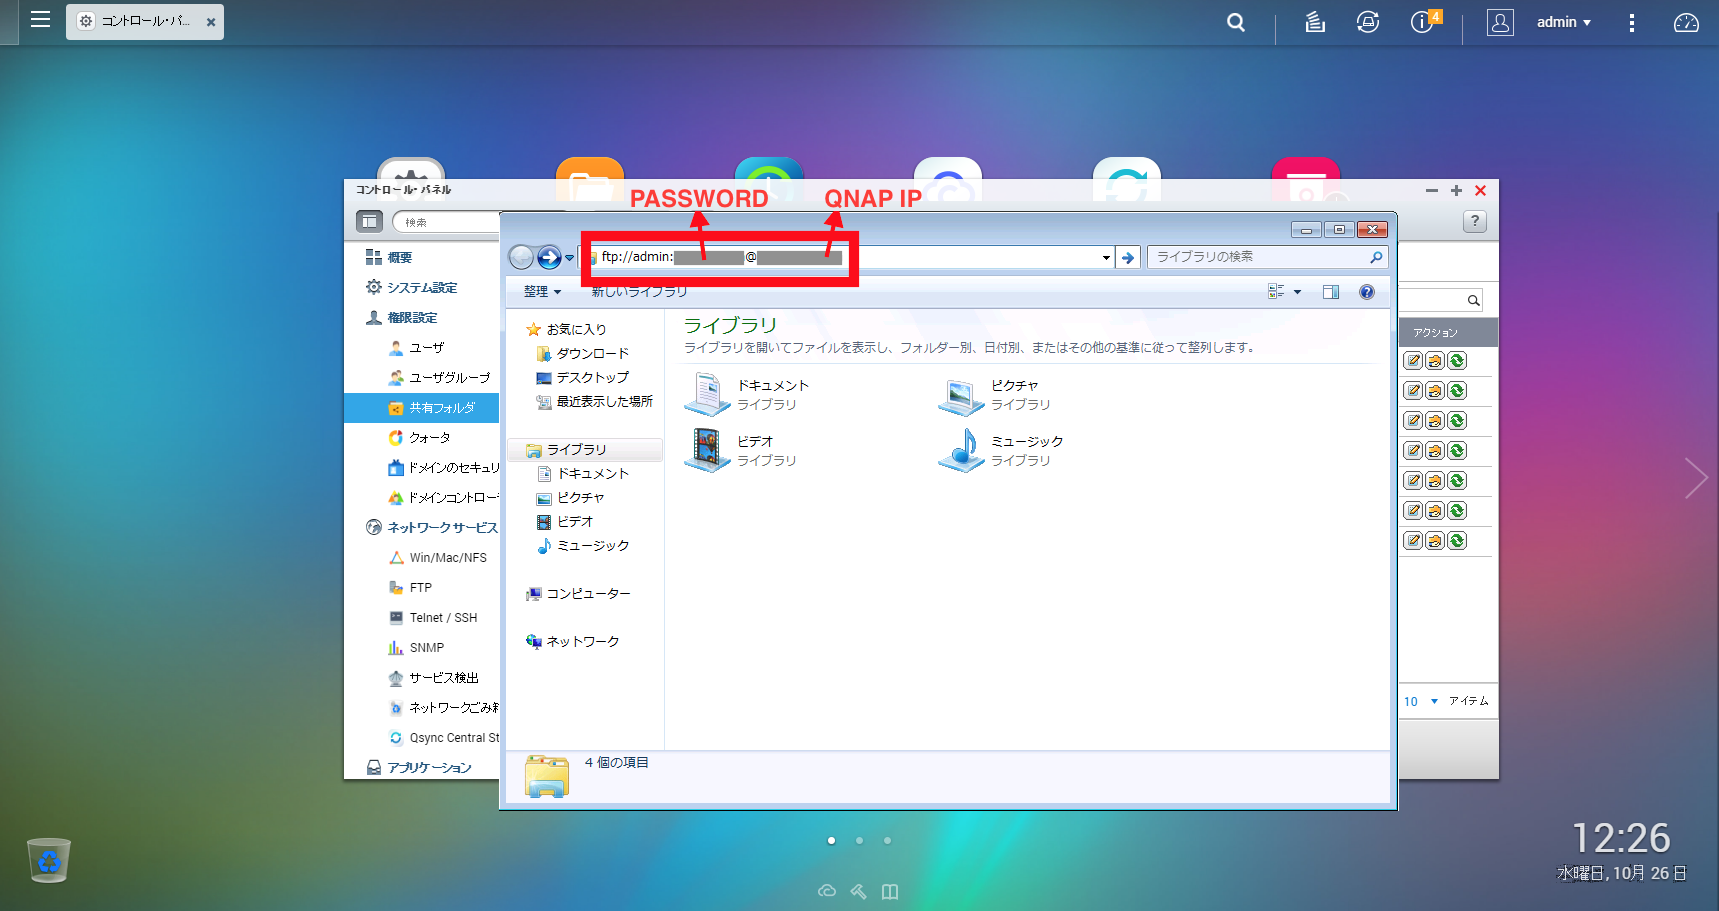 "Windows Explorerに直接「ftp://username:password@<まるごとQNAPのIPアドレス>/」と入力"" /></a></div> <div class="